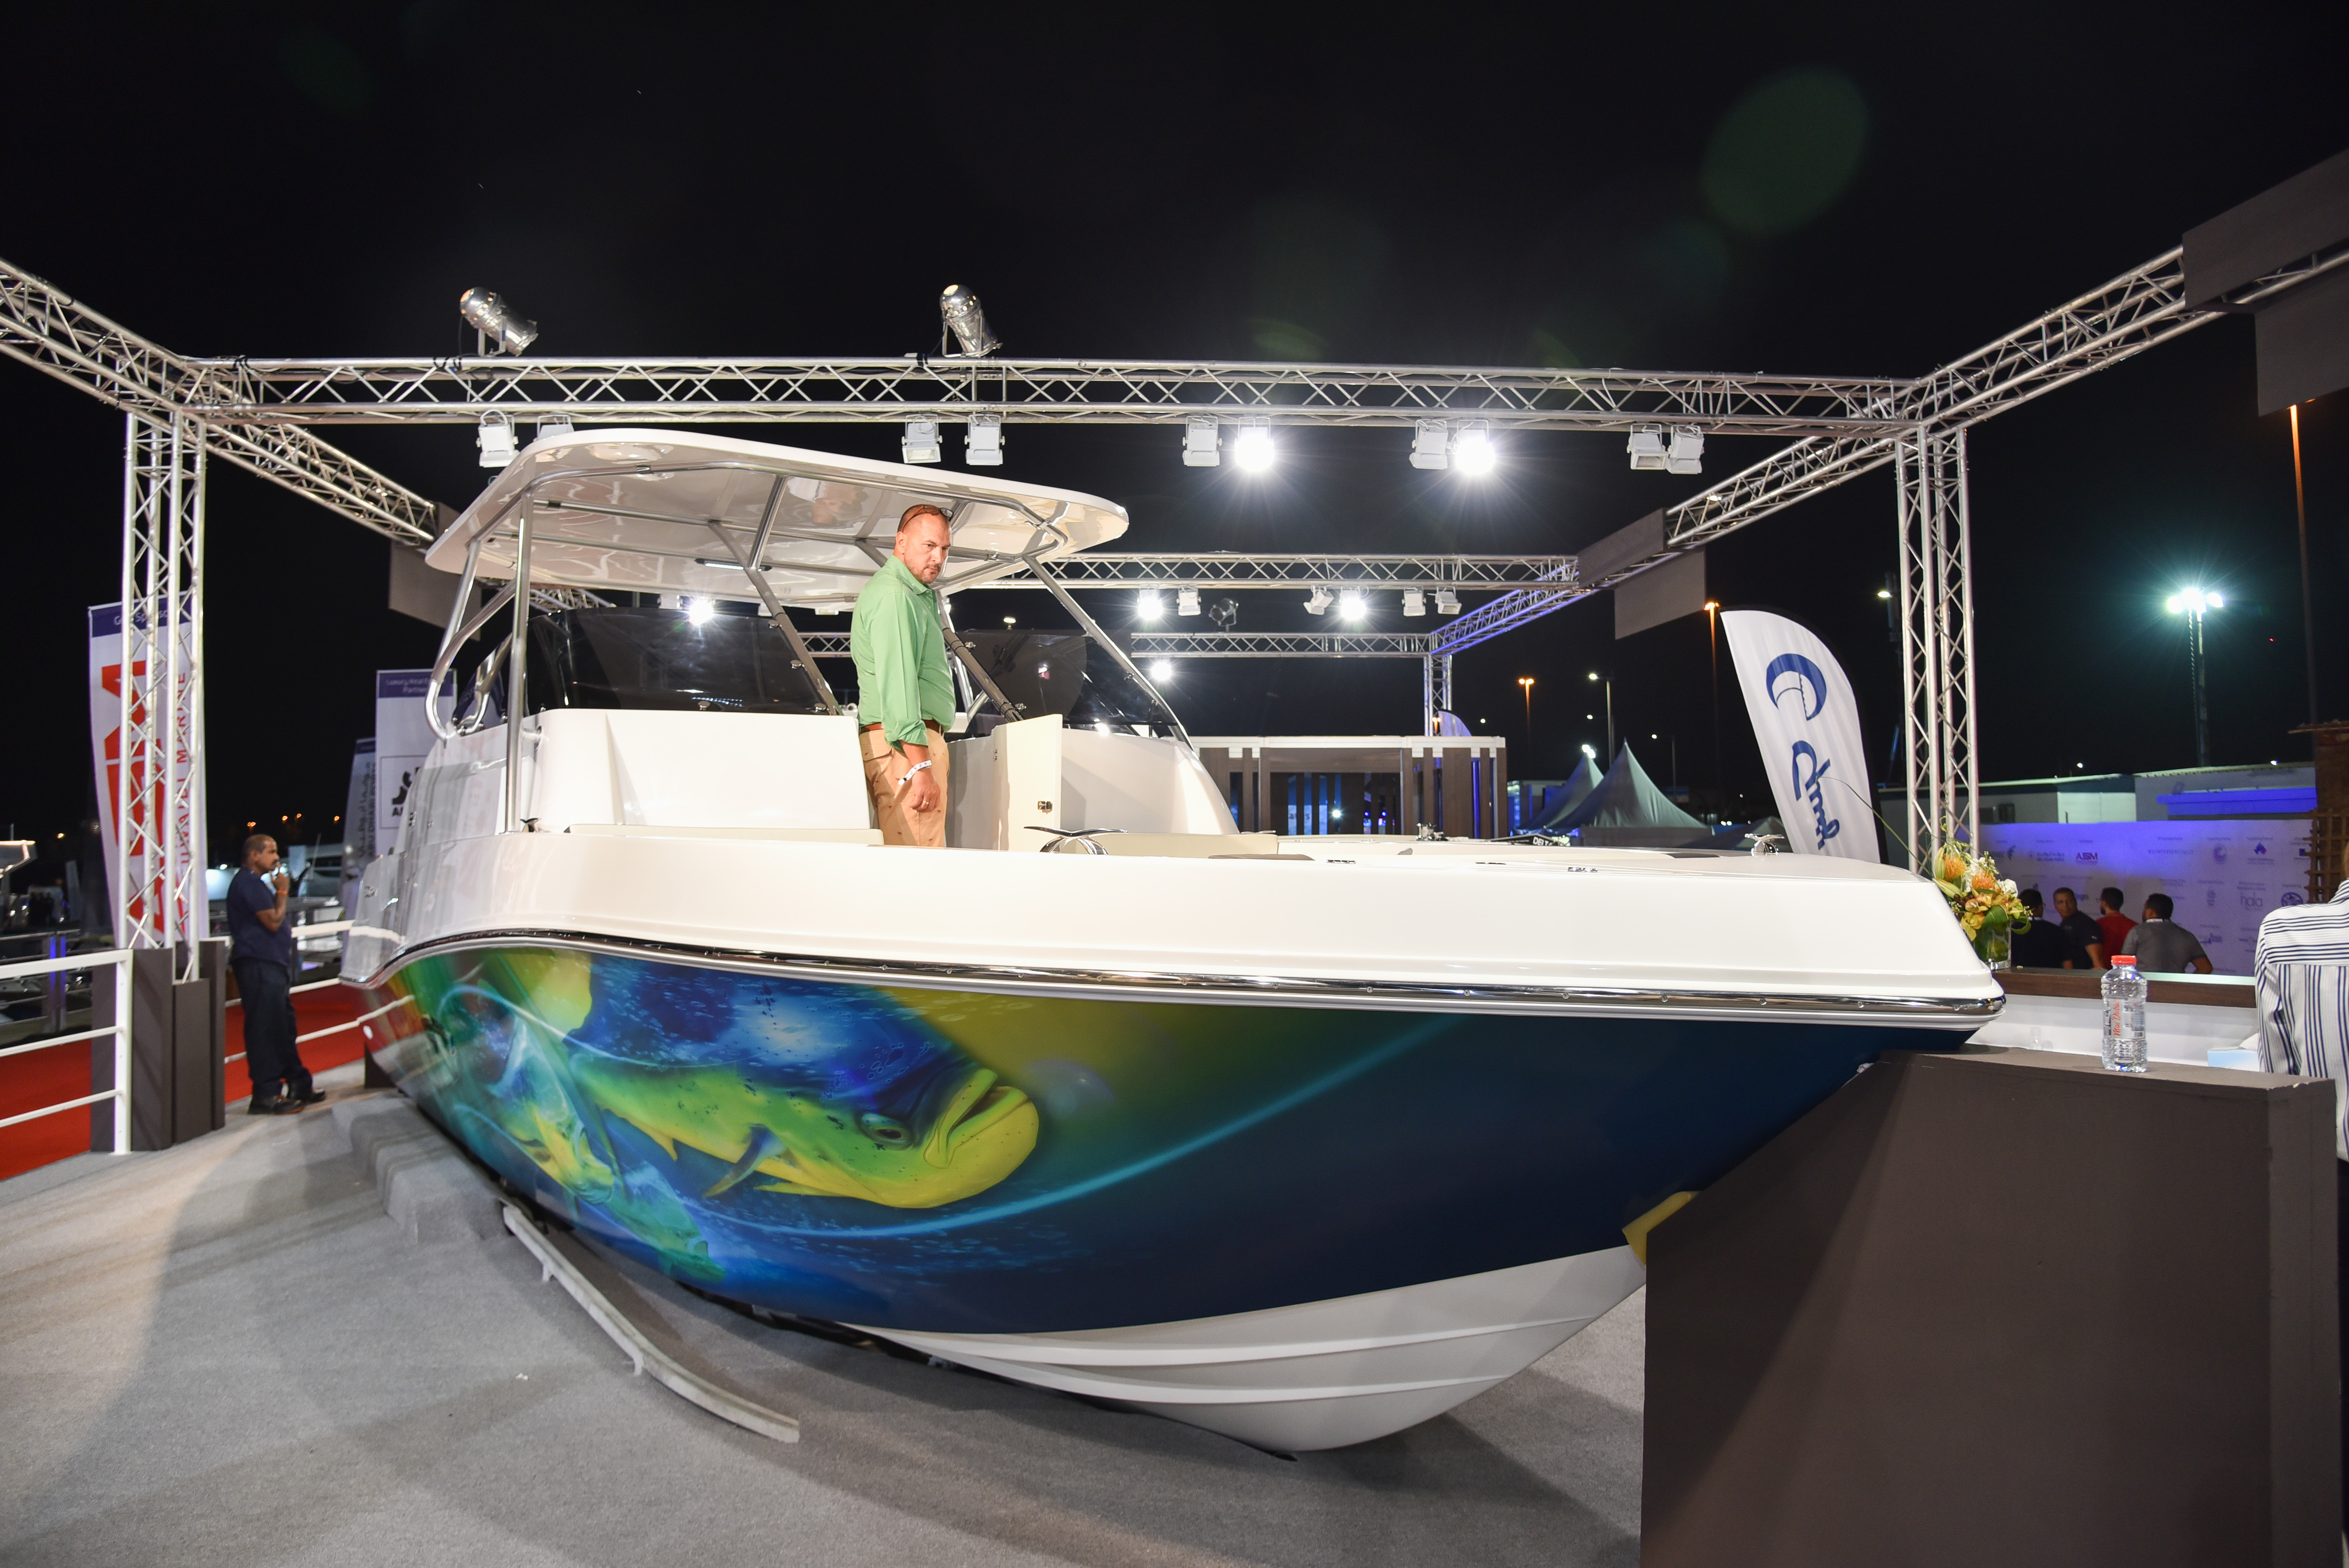 Gulf Craft at Abu Dhabi Boat Show 2018 Day 3 (39).jpg